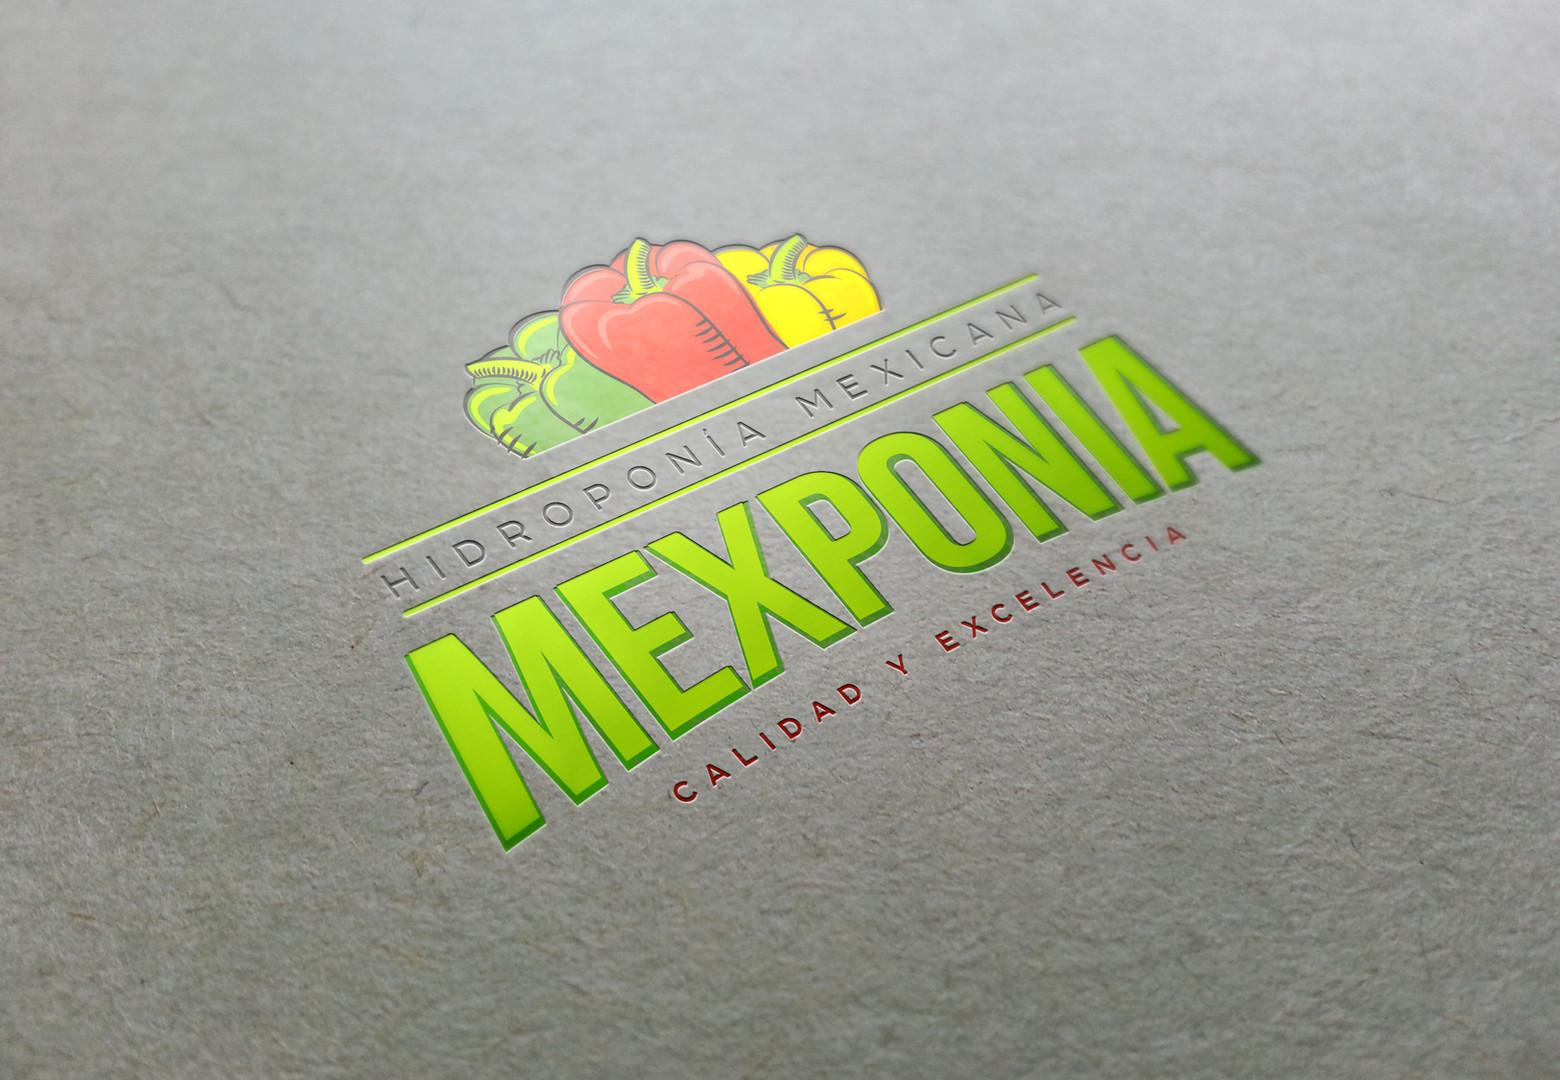 Mexponia